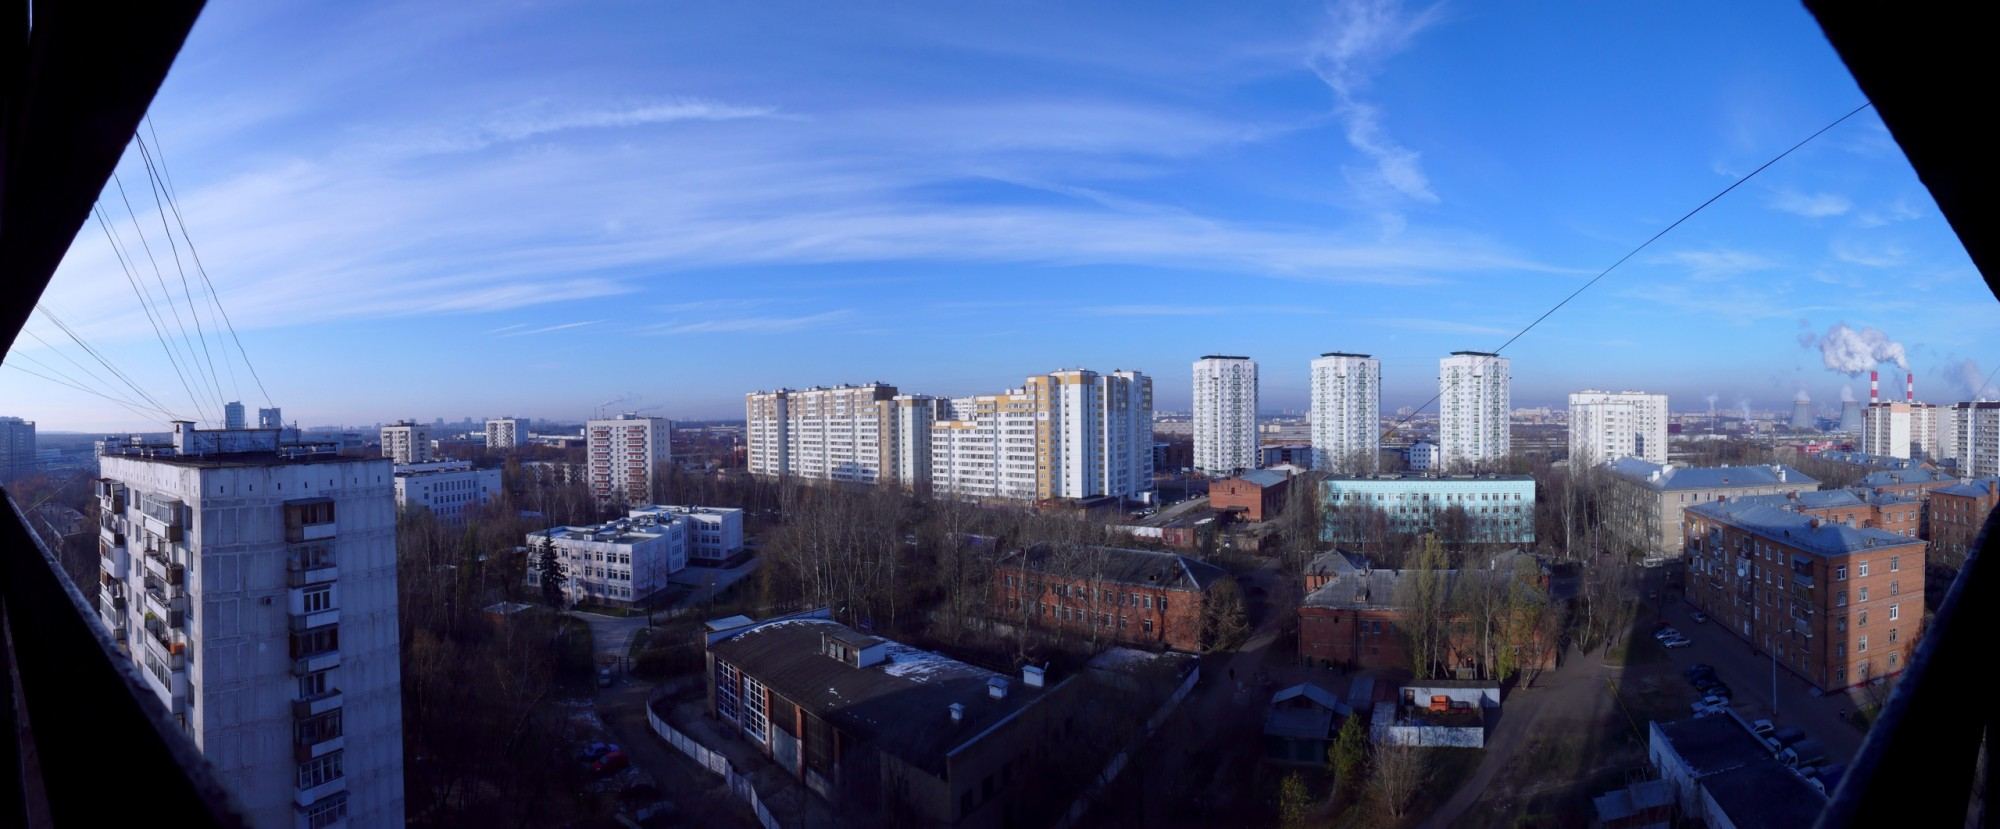 2009 панорама Очаково. Кирилл